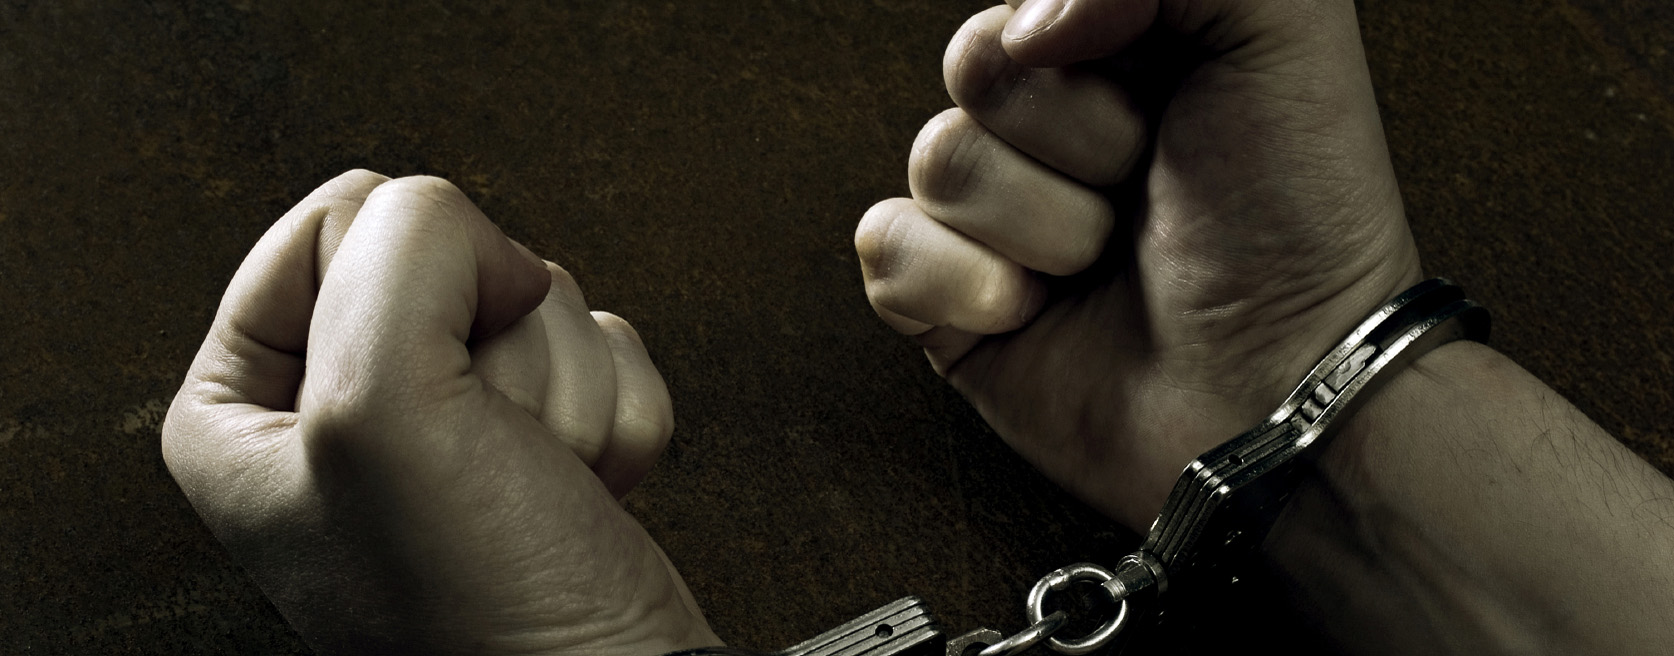 Choosing a bail bond agency in Orange County, CA